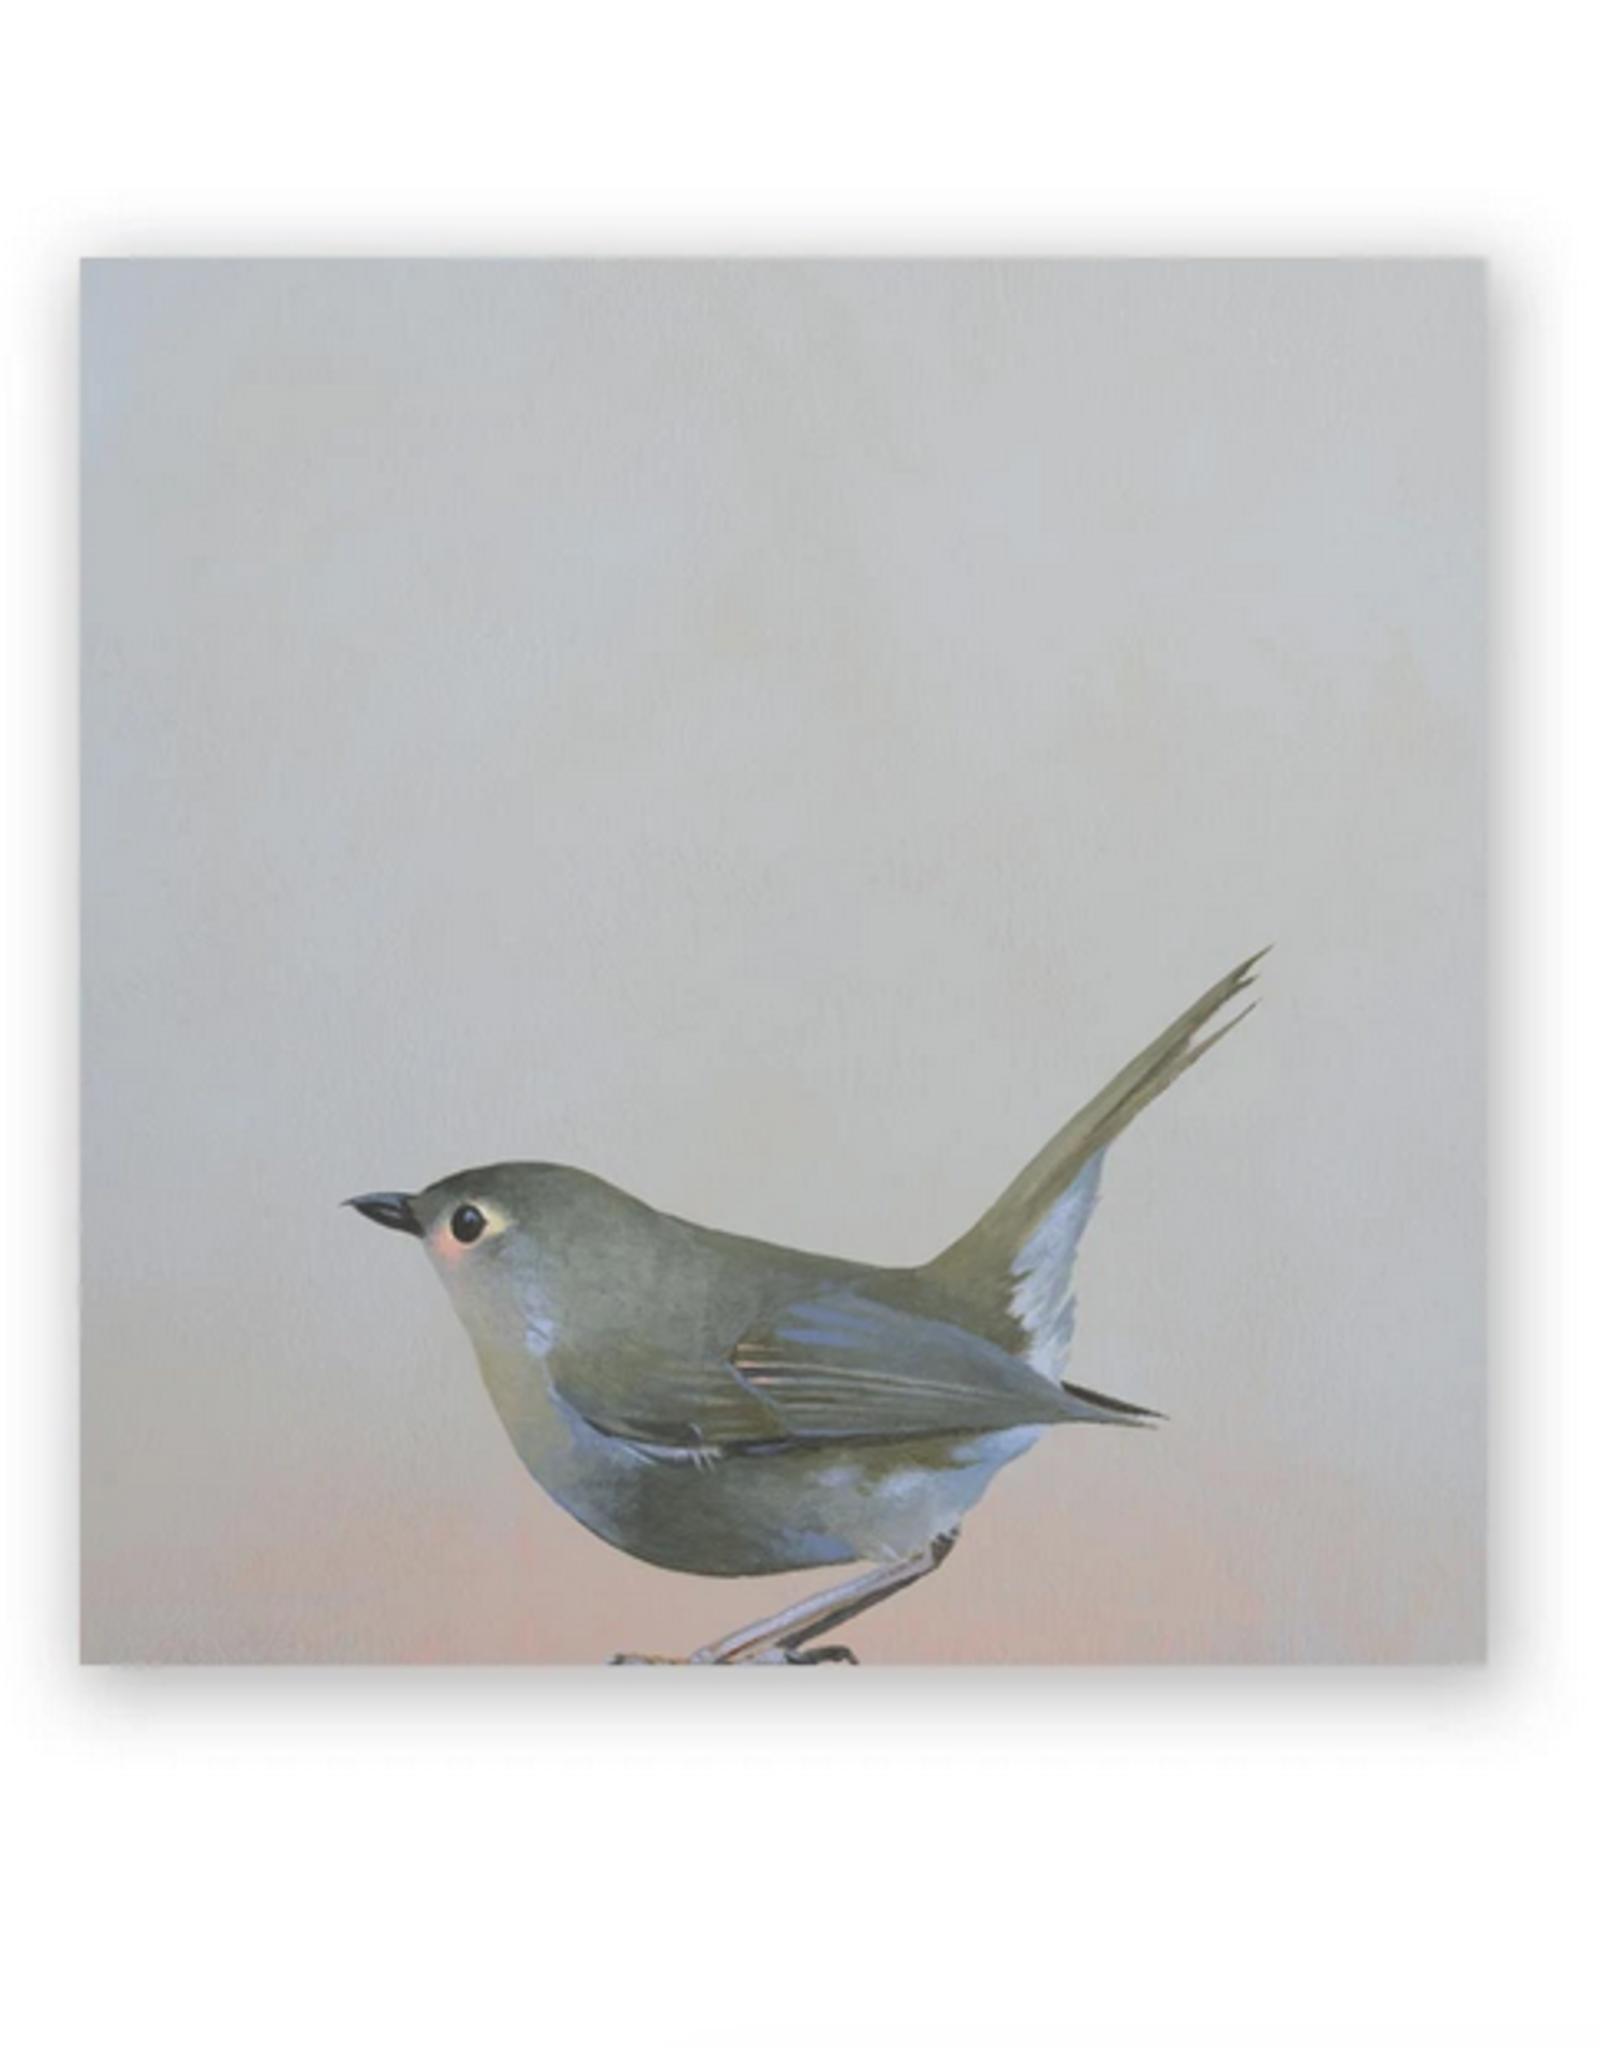 Wings on Wood - Fictional Robin